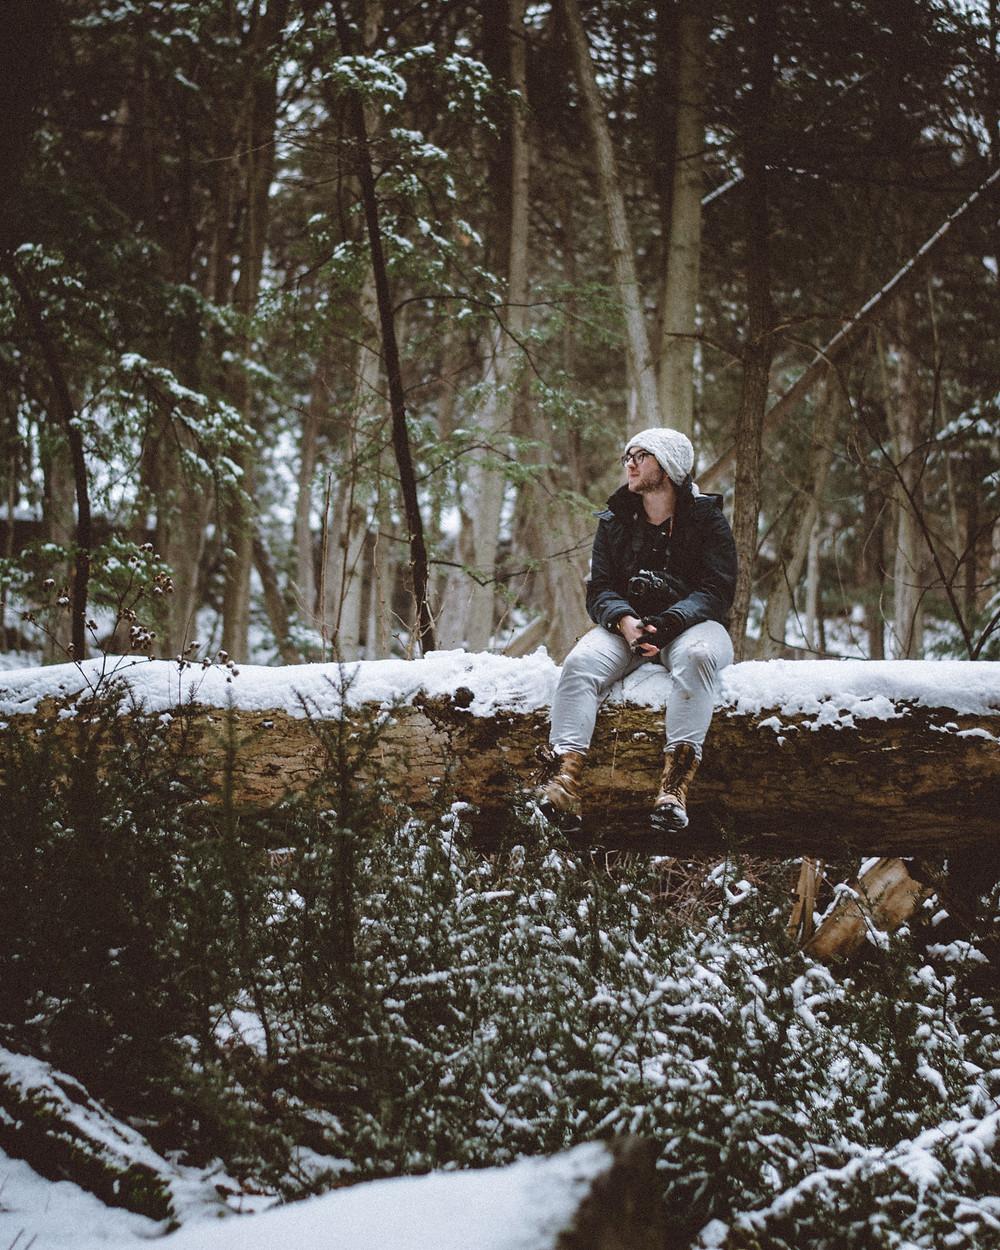 Hombre sentado sobre un tronco en bosque nevado